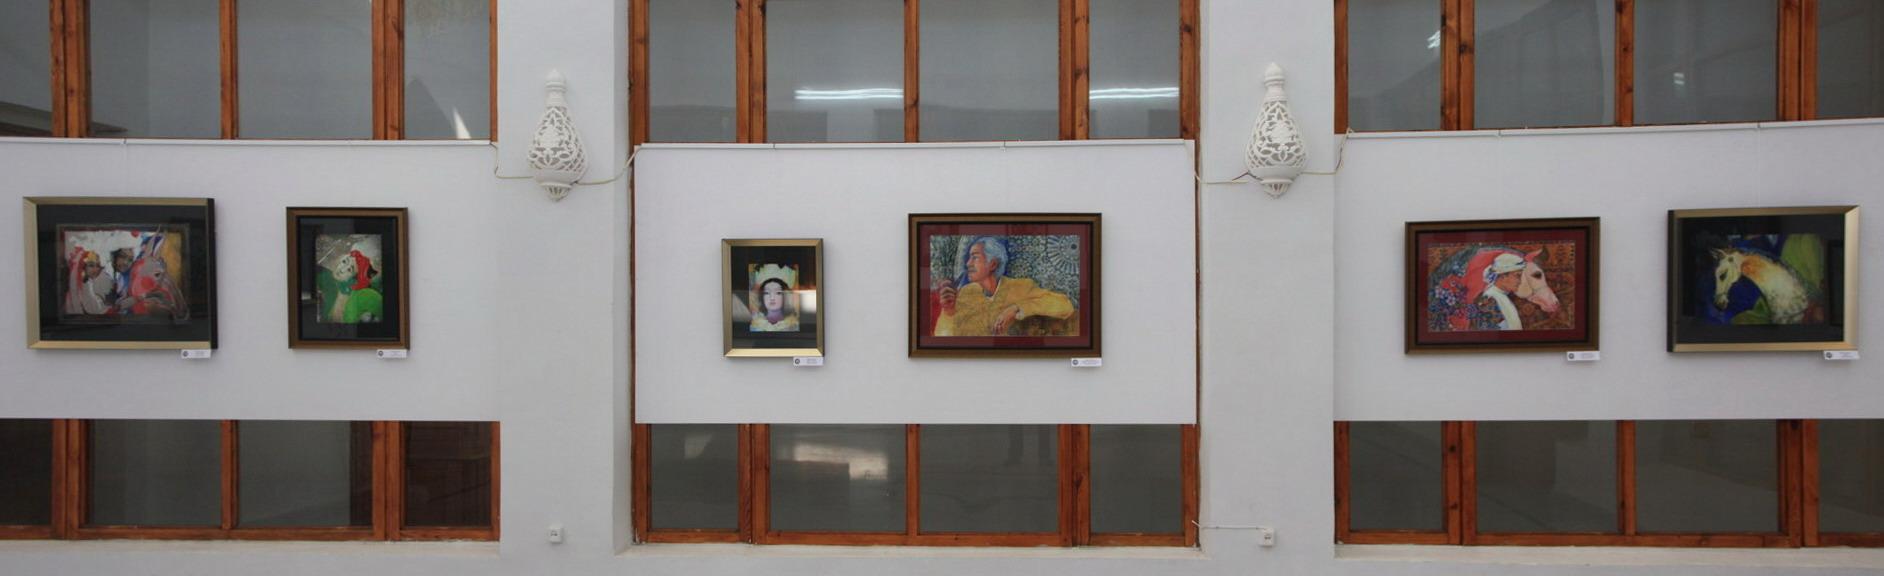 Экспозиция картин Коровиной Марии. 2017